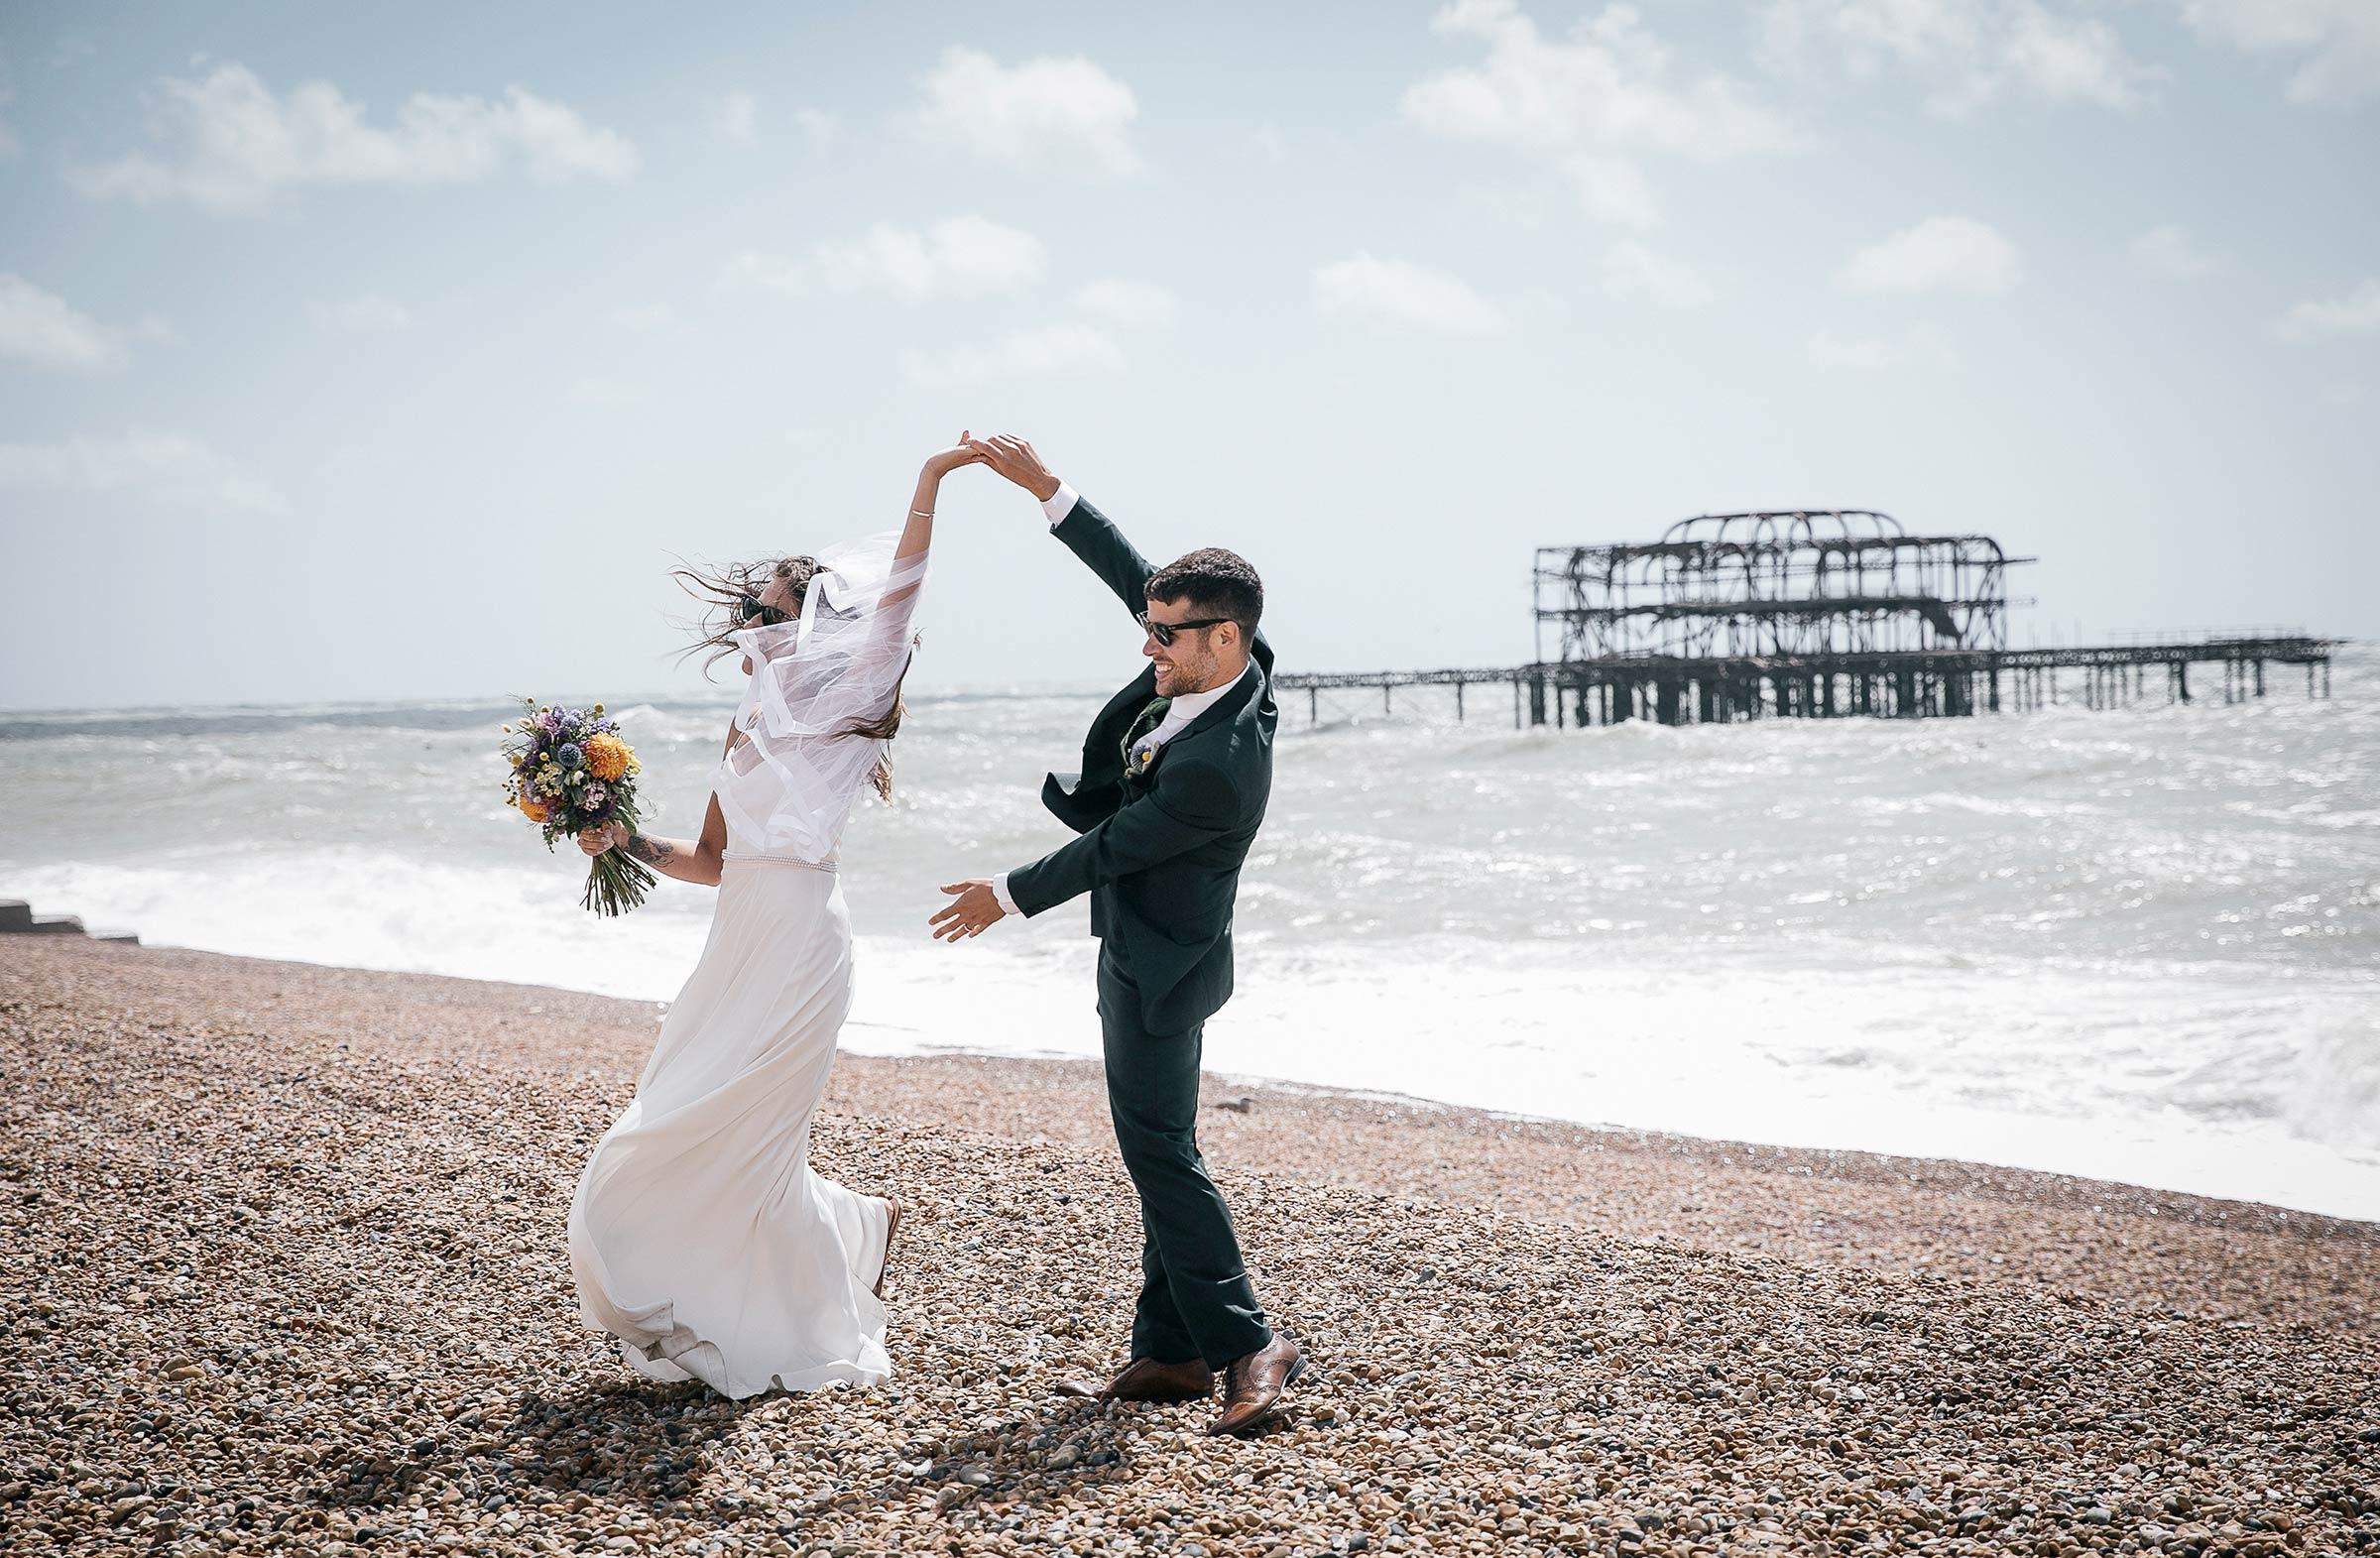 Information - My Beautiful Bride Wedding Photographer